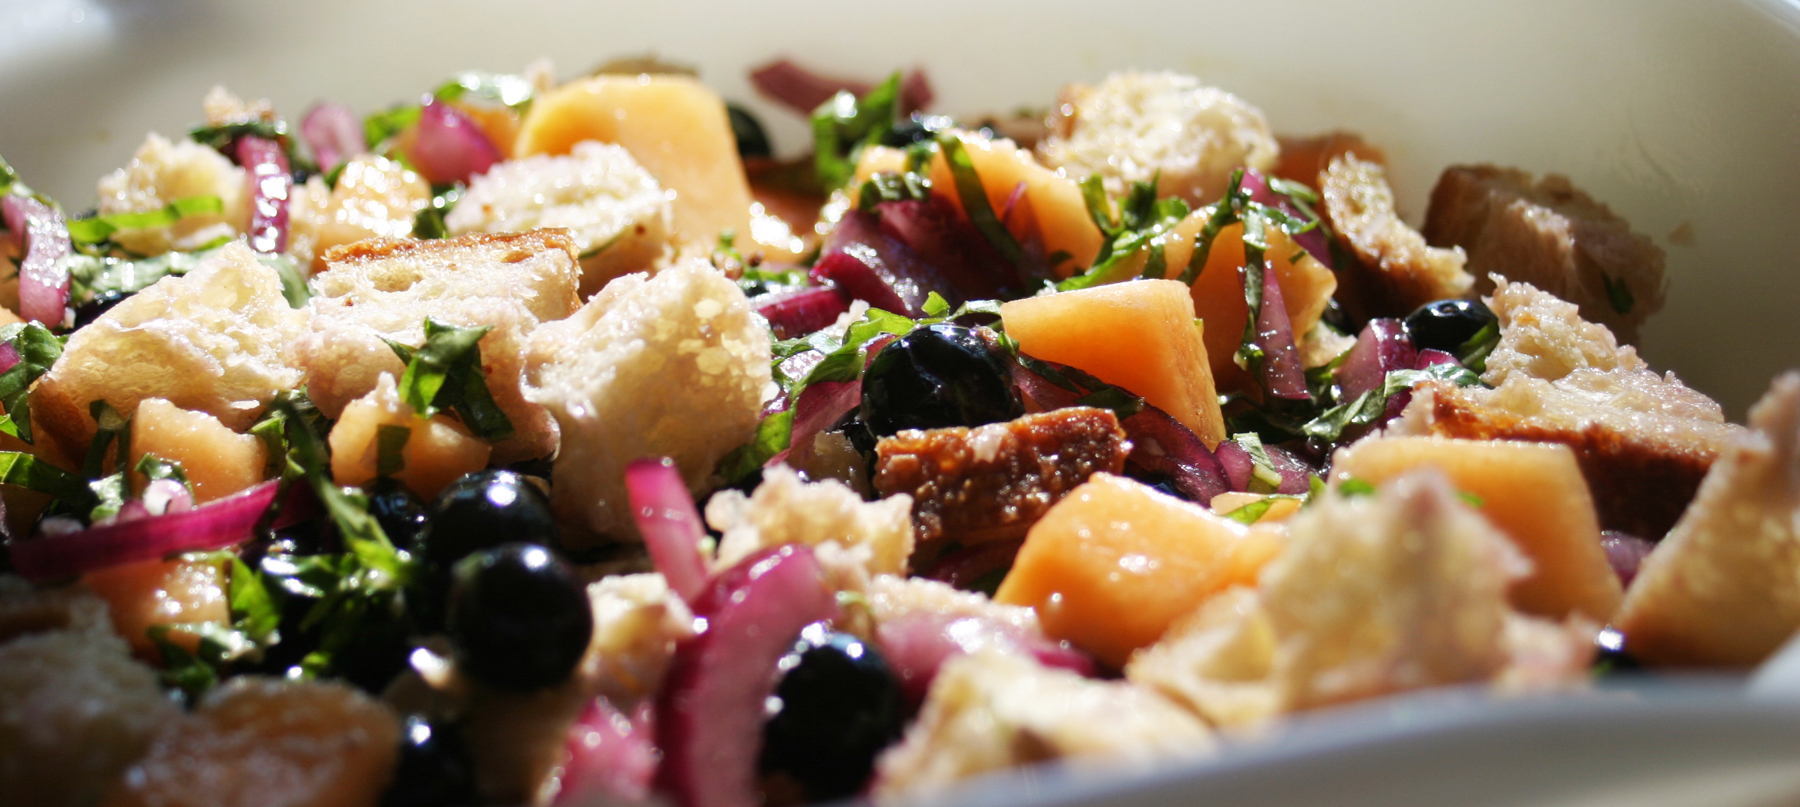 Blueberry Cantaloupe Panzanella as a fresh summer salad